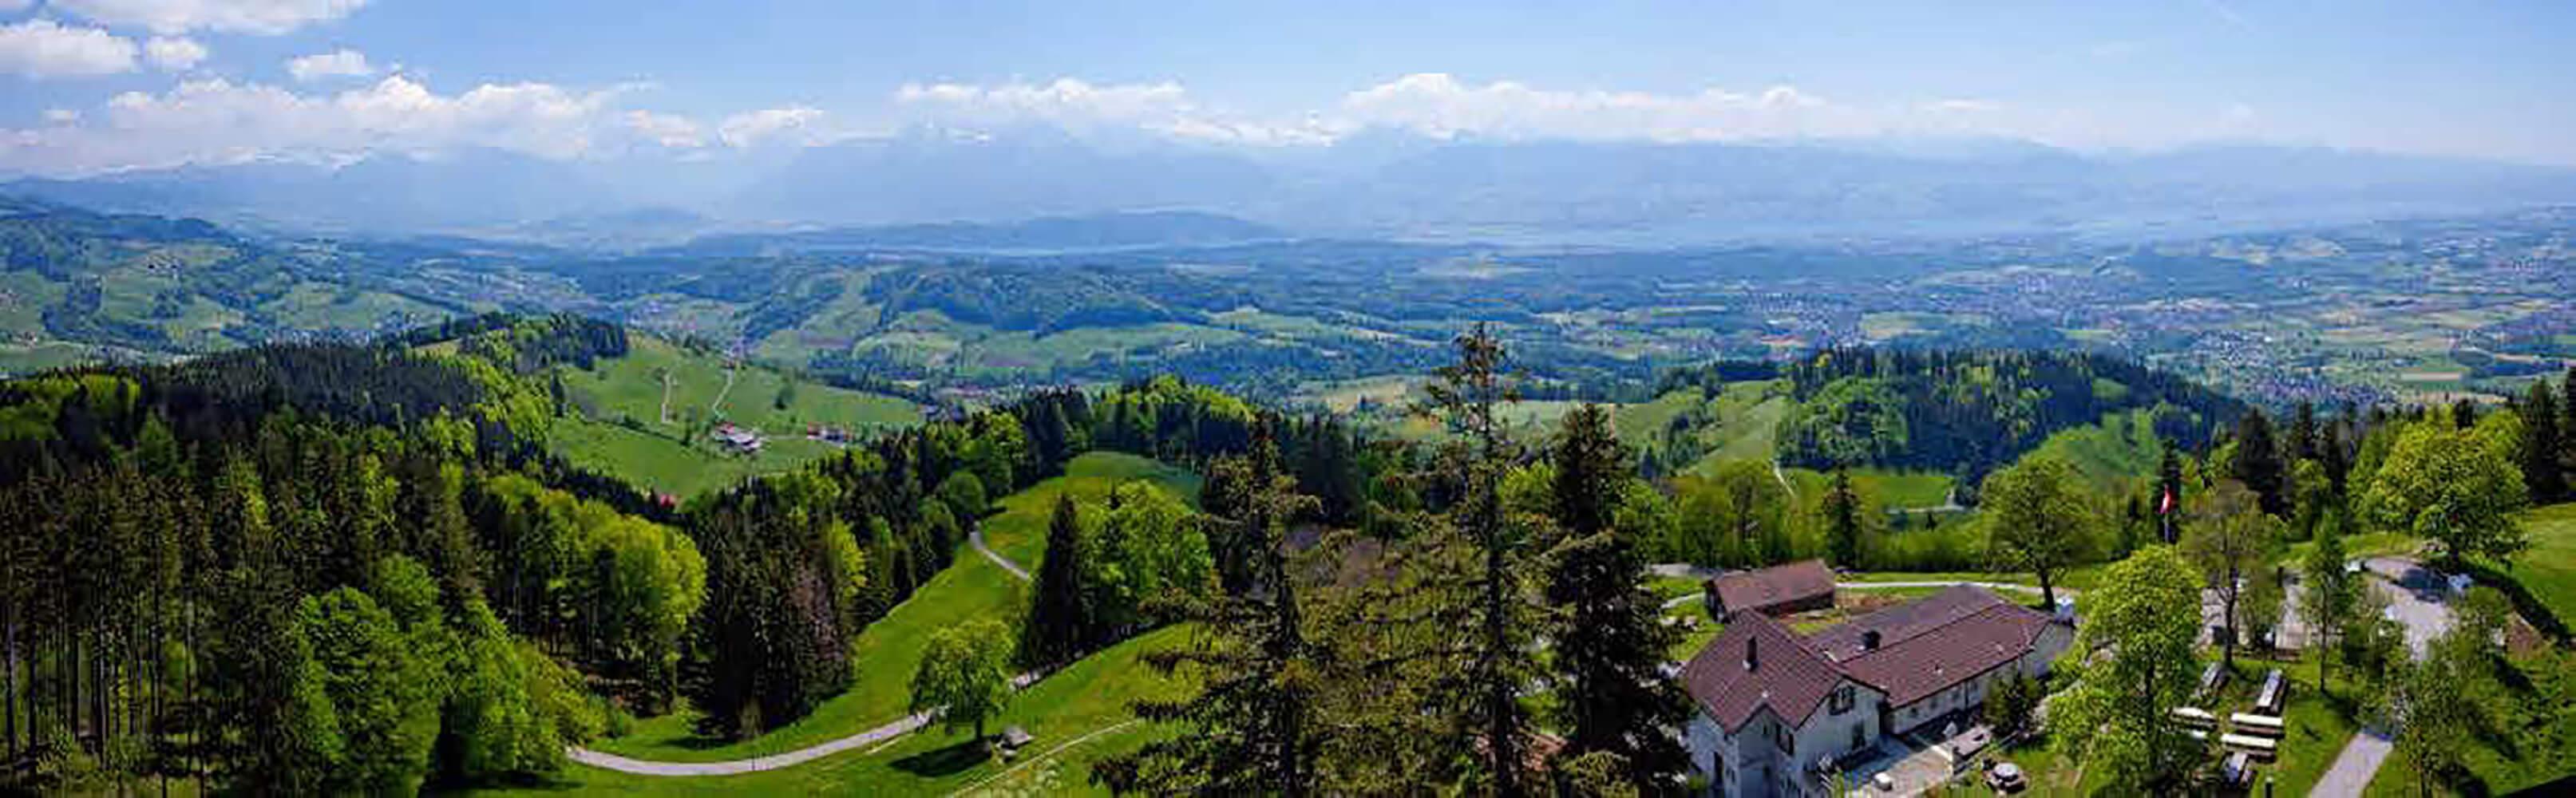 Aussichtsplattform Bachtel – Gibswil/Wald  1